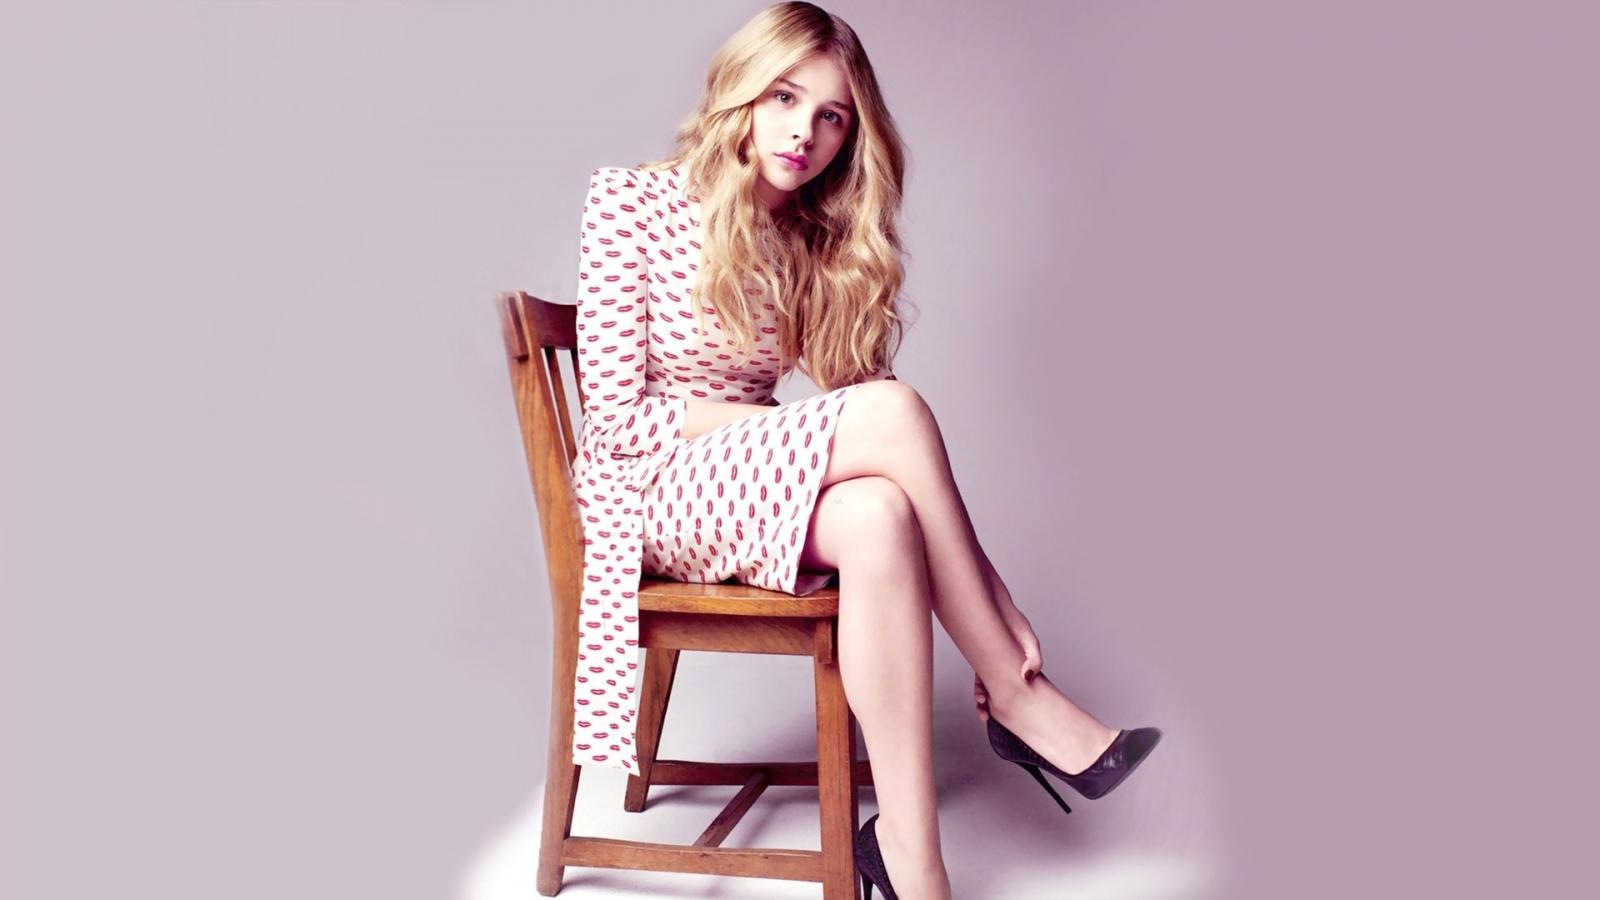 Chloe Grace Moretz, sit, celebrity, 1600x900 wallpaper